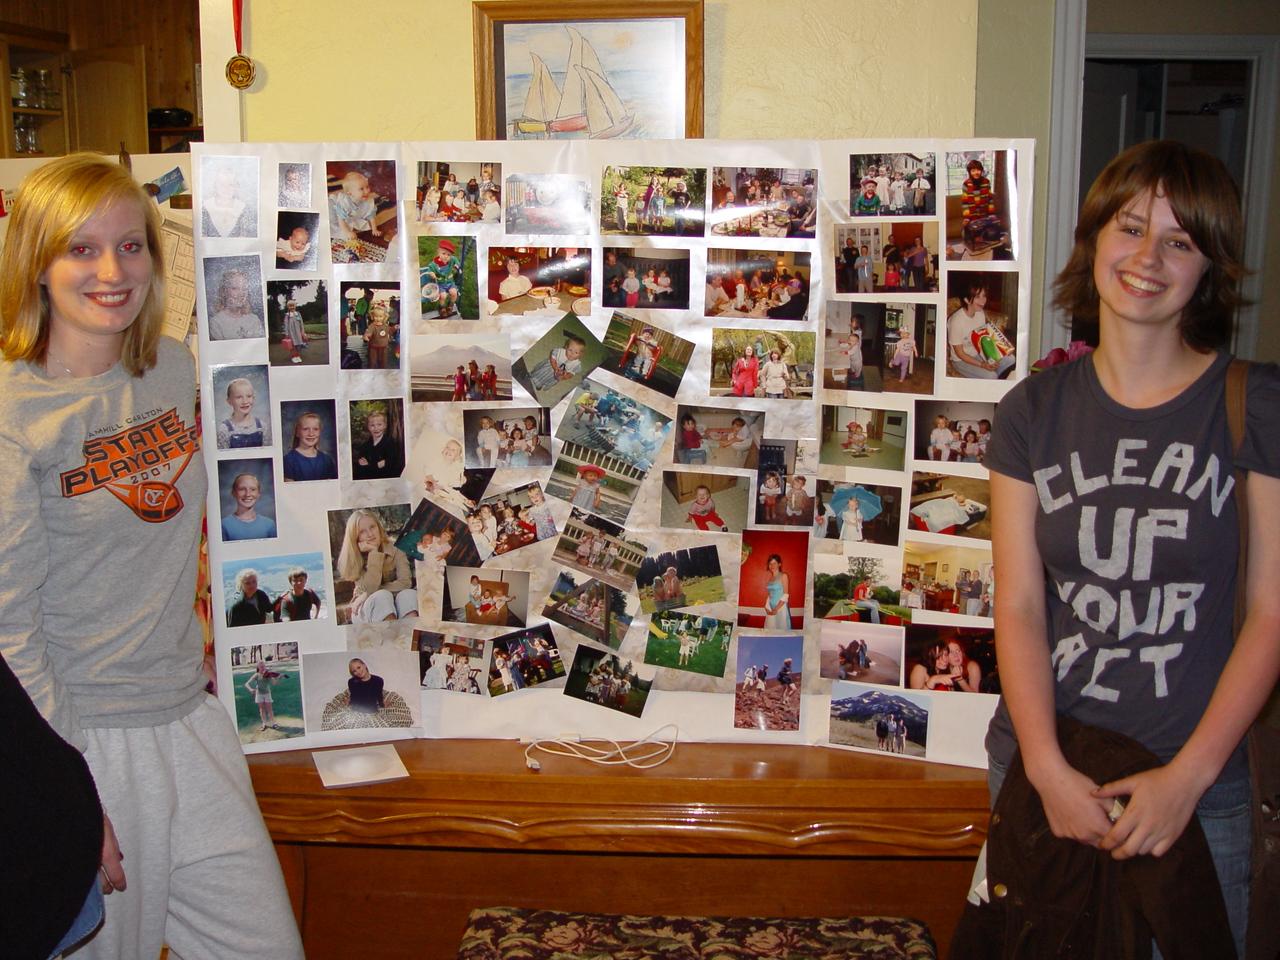 Carrie & Anwen's Graduation Photo Board